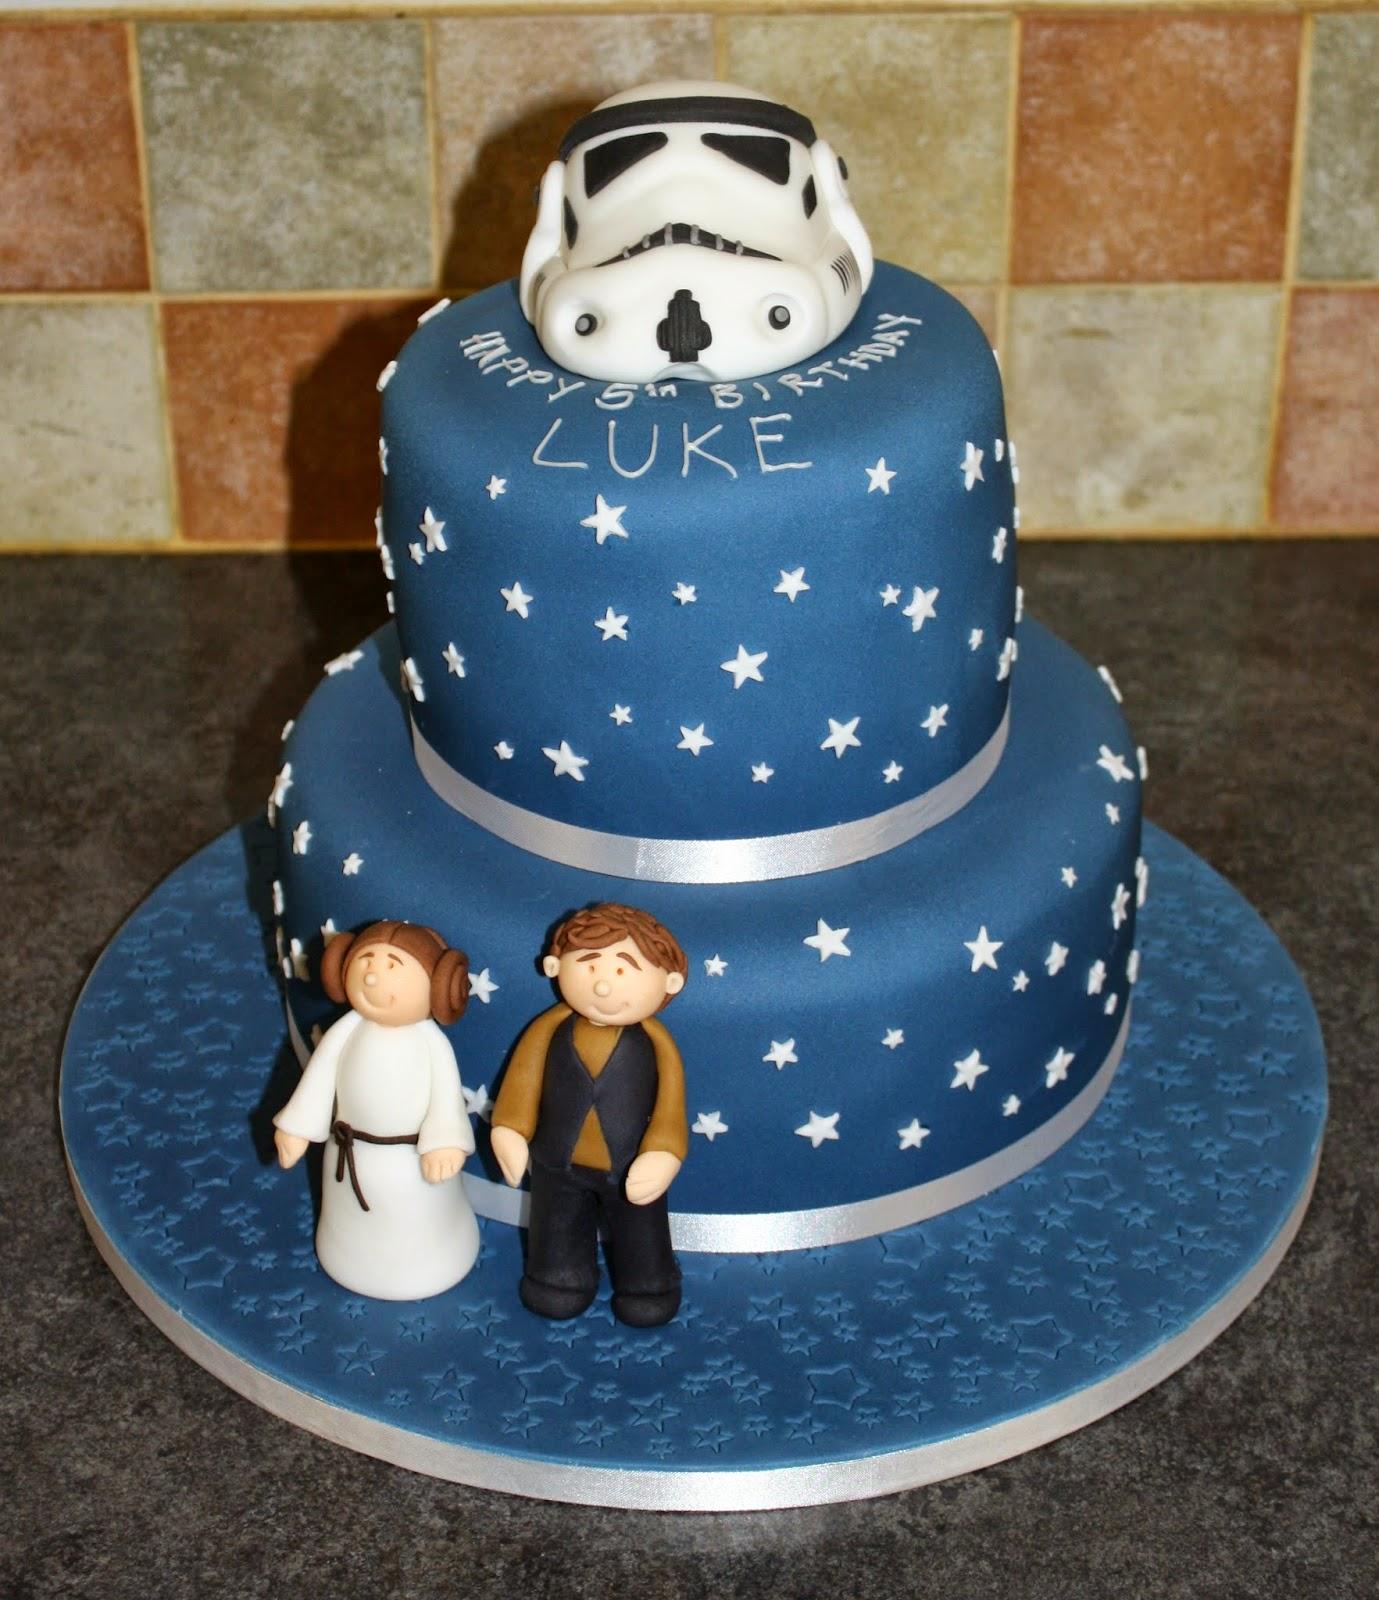 Tallulahs Bakery Star Wars Themed 5th Birthday Cake